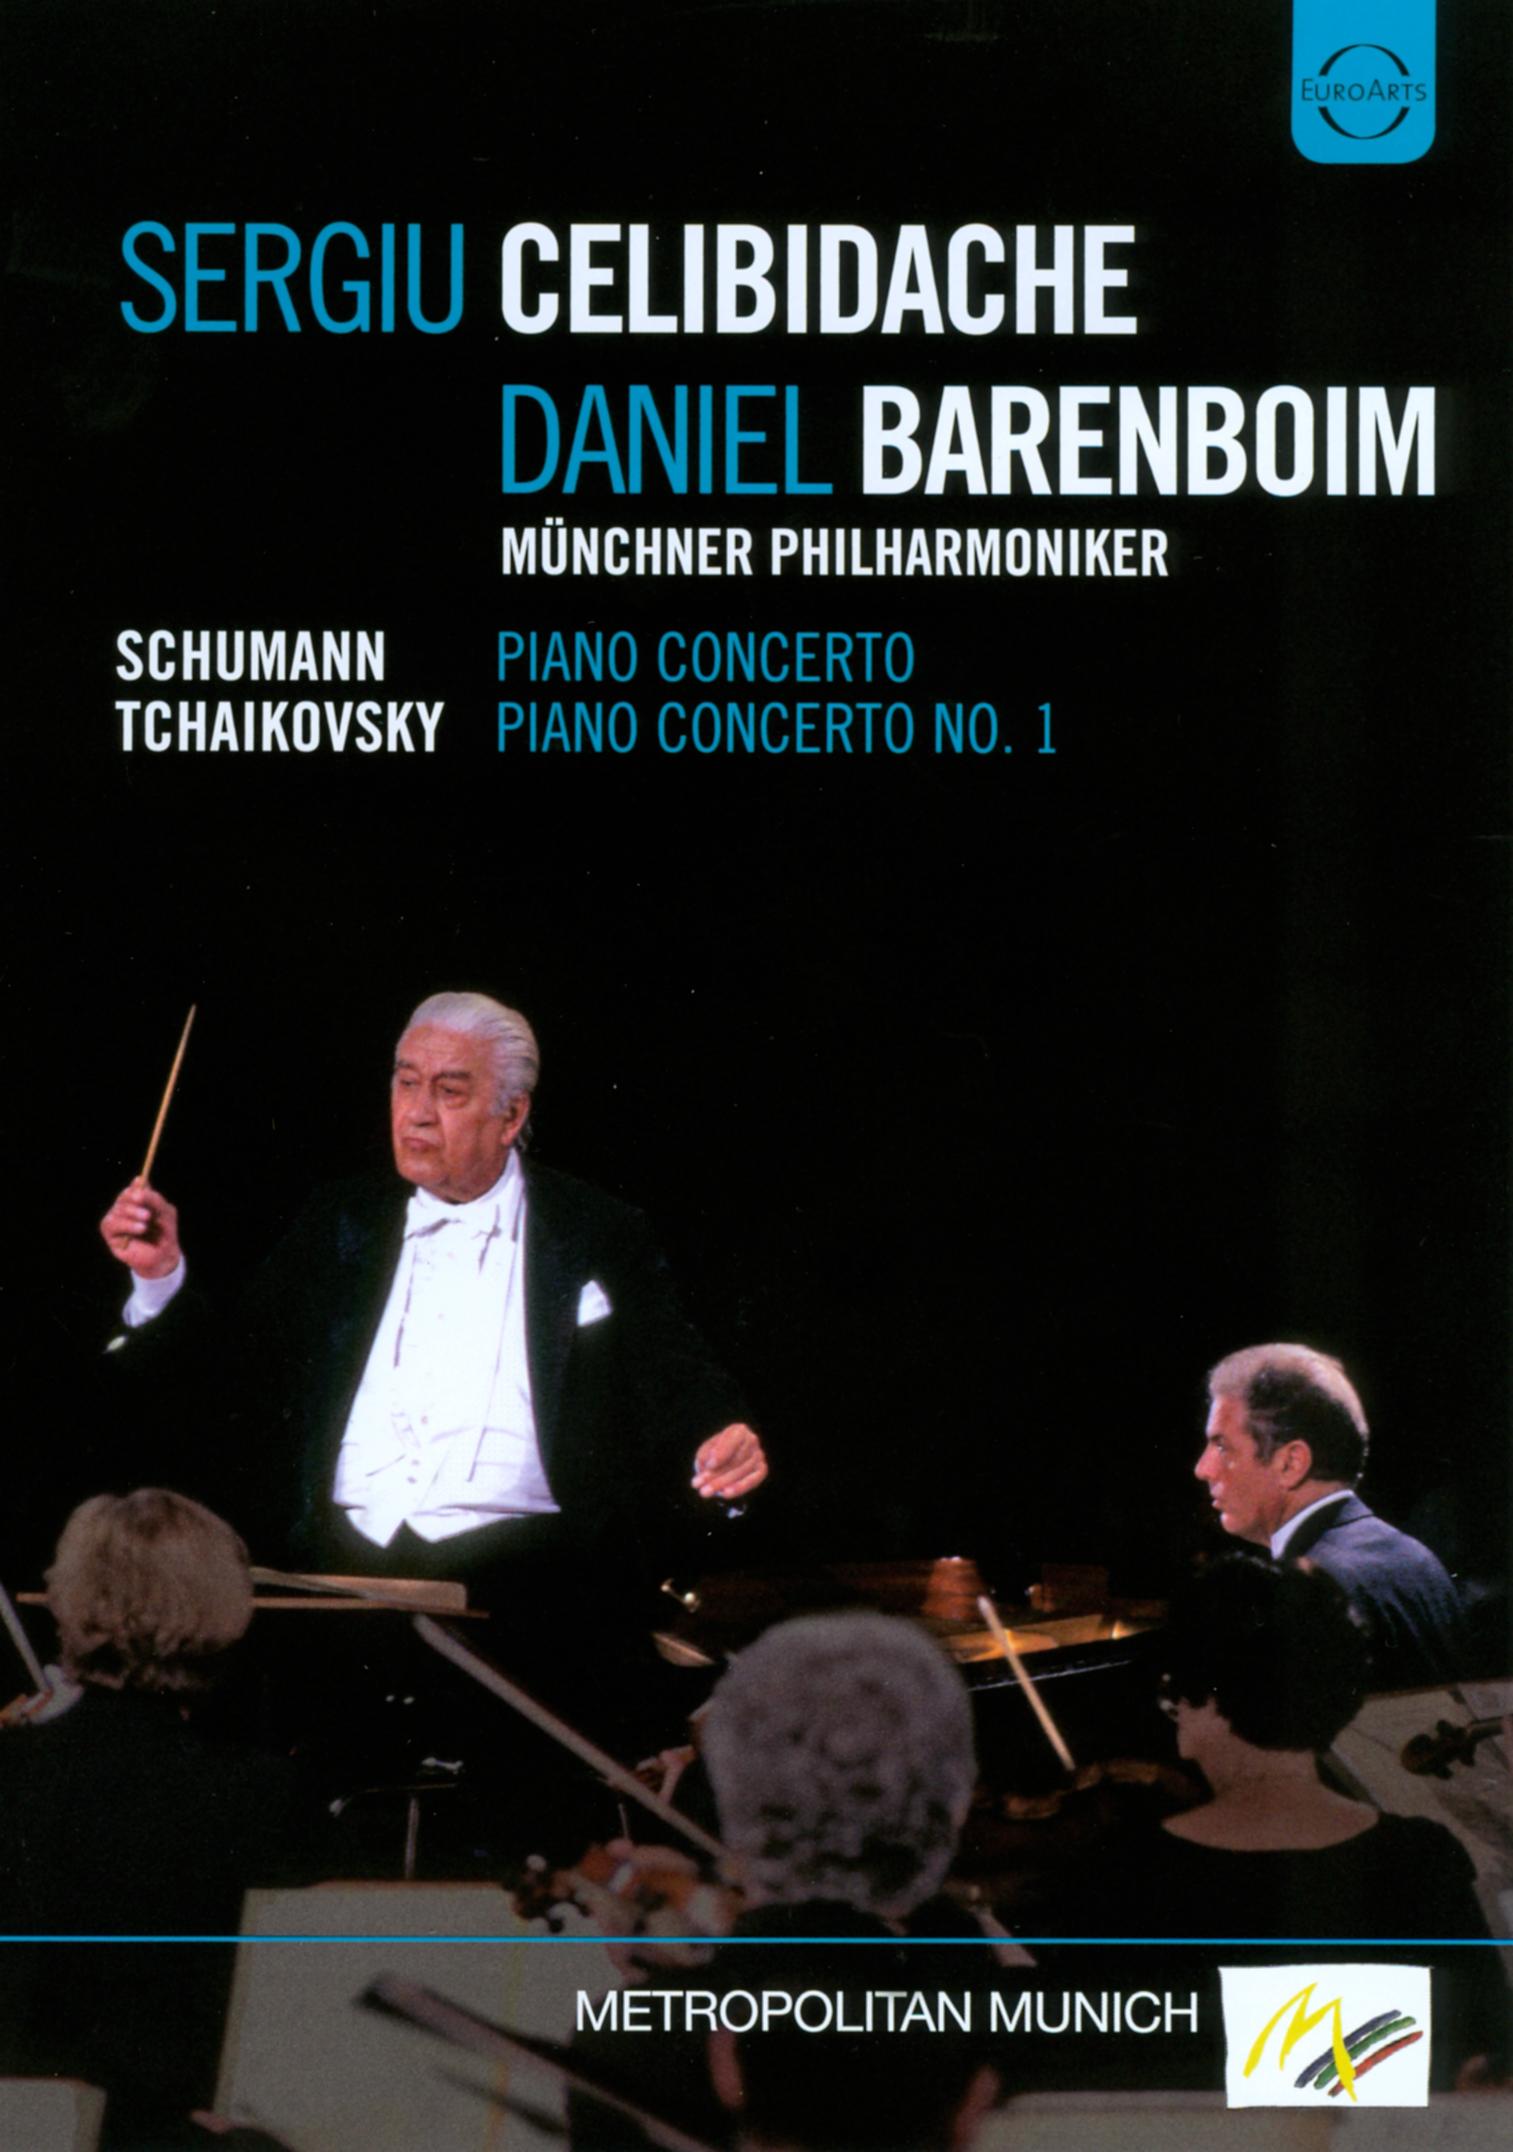 Sergiu Celibidache/Daniel Barenboim: Schumann/Tchaikovsky - Piano Concertos